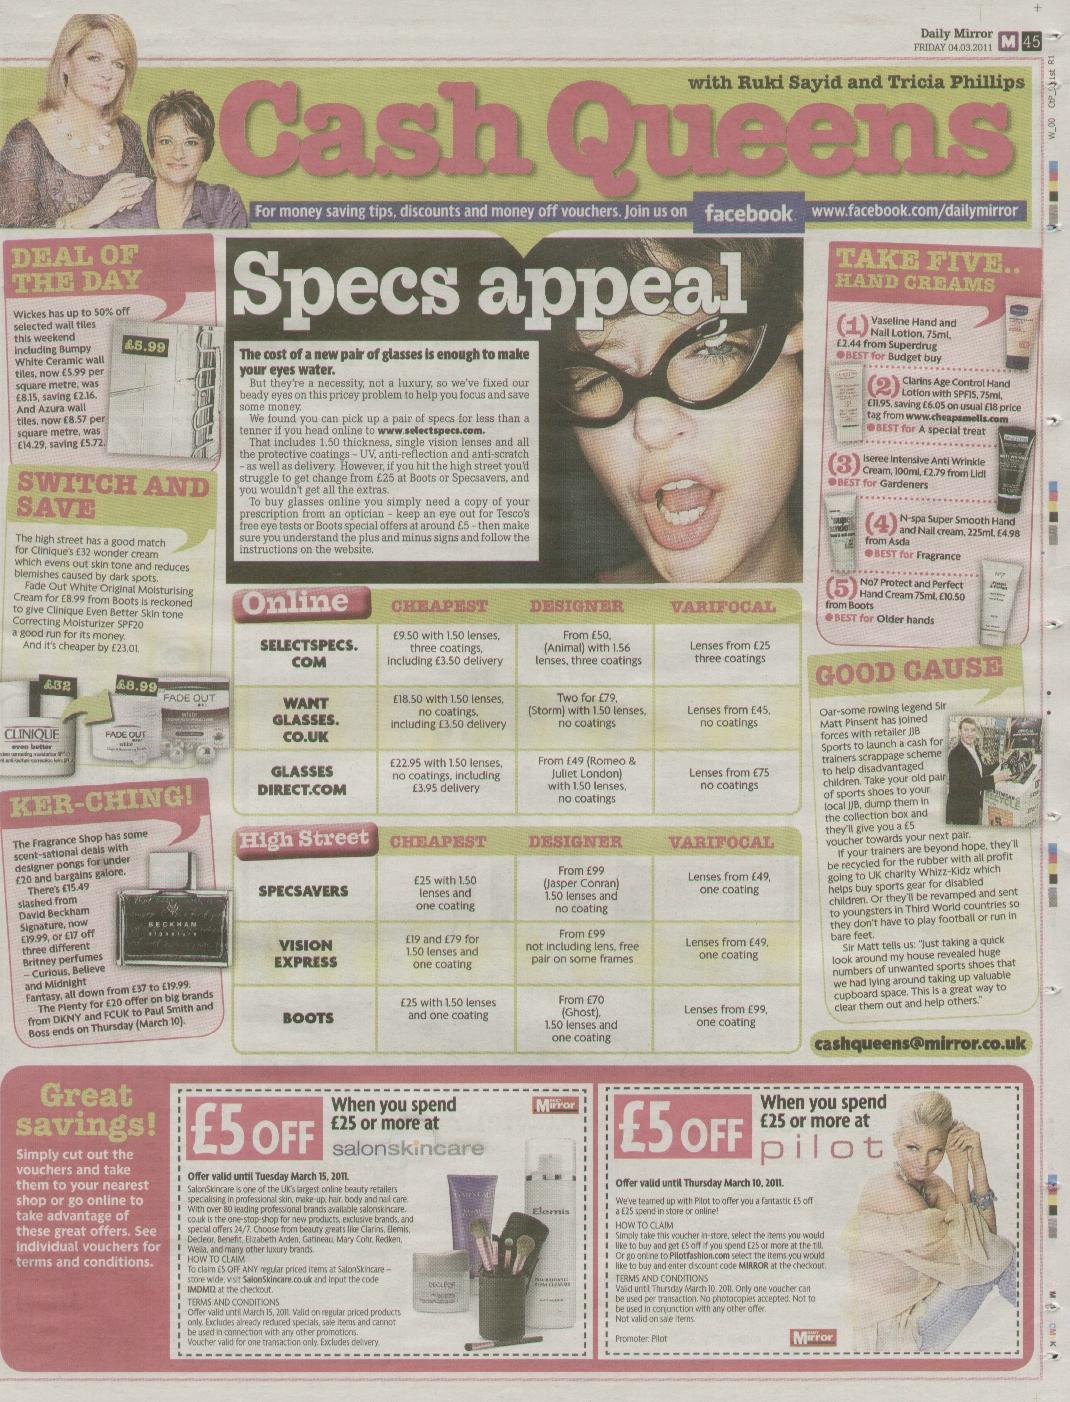 Daily Mirror Cash Queens 4 March 2011